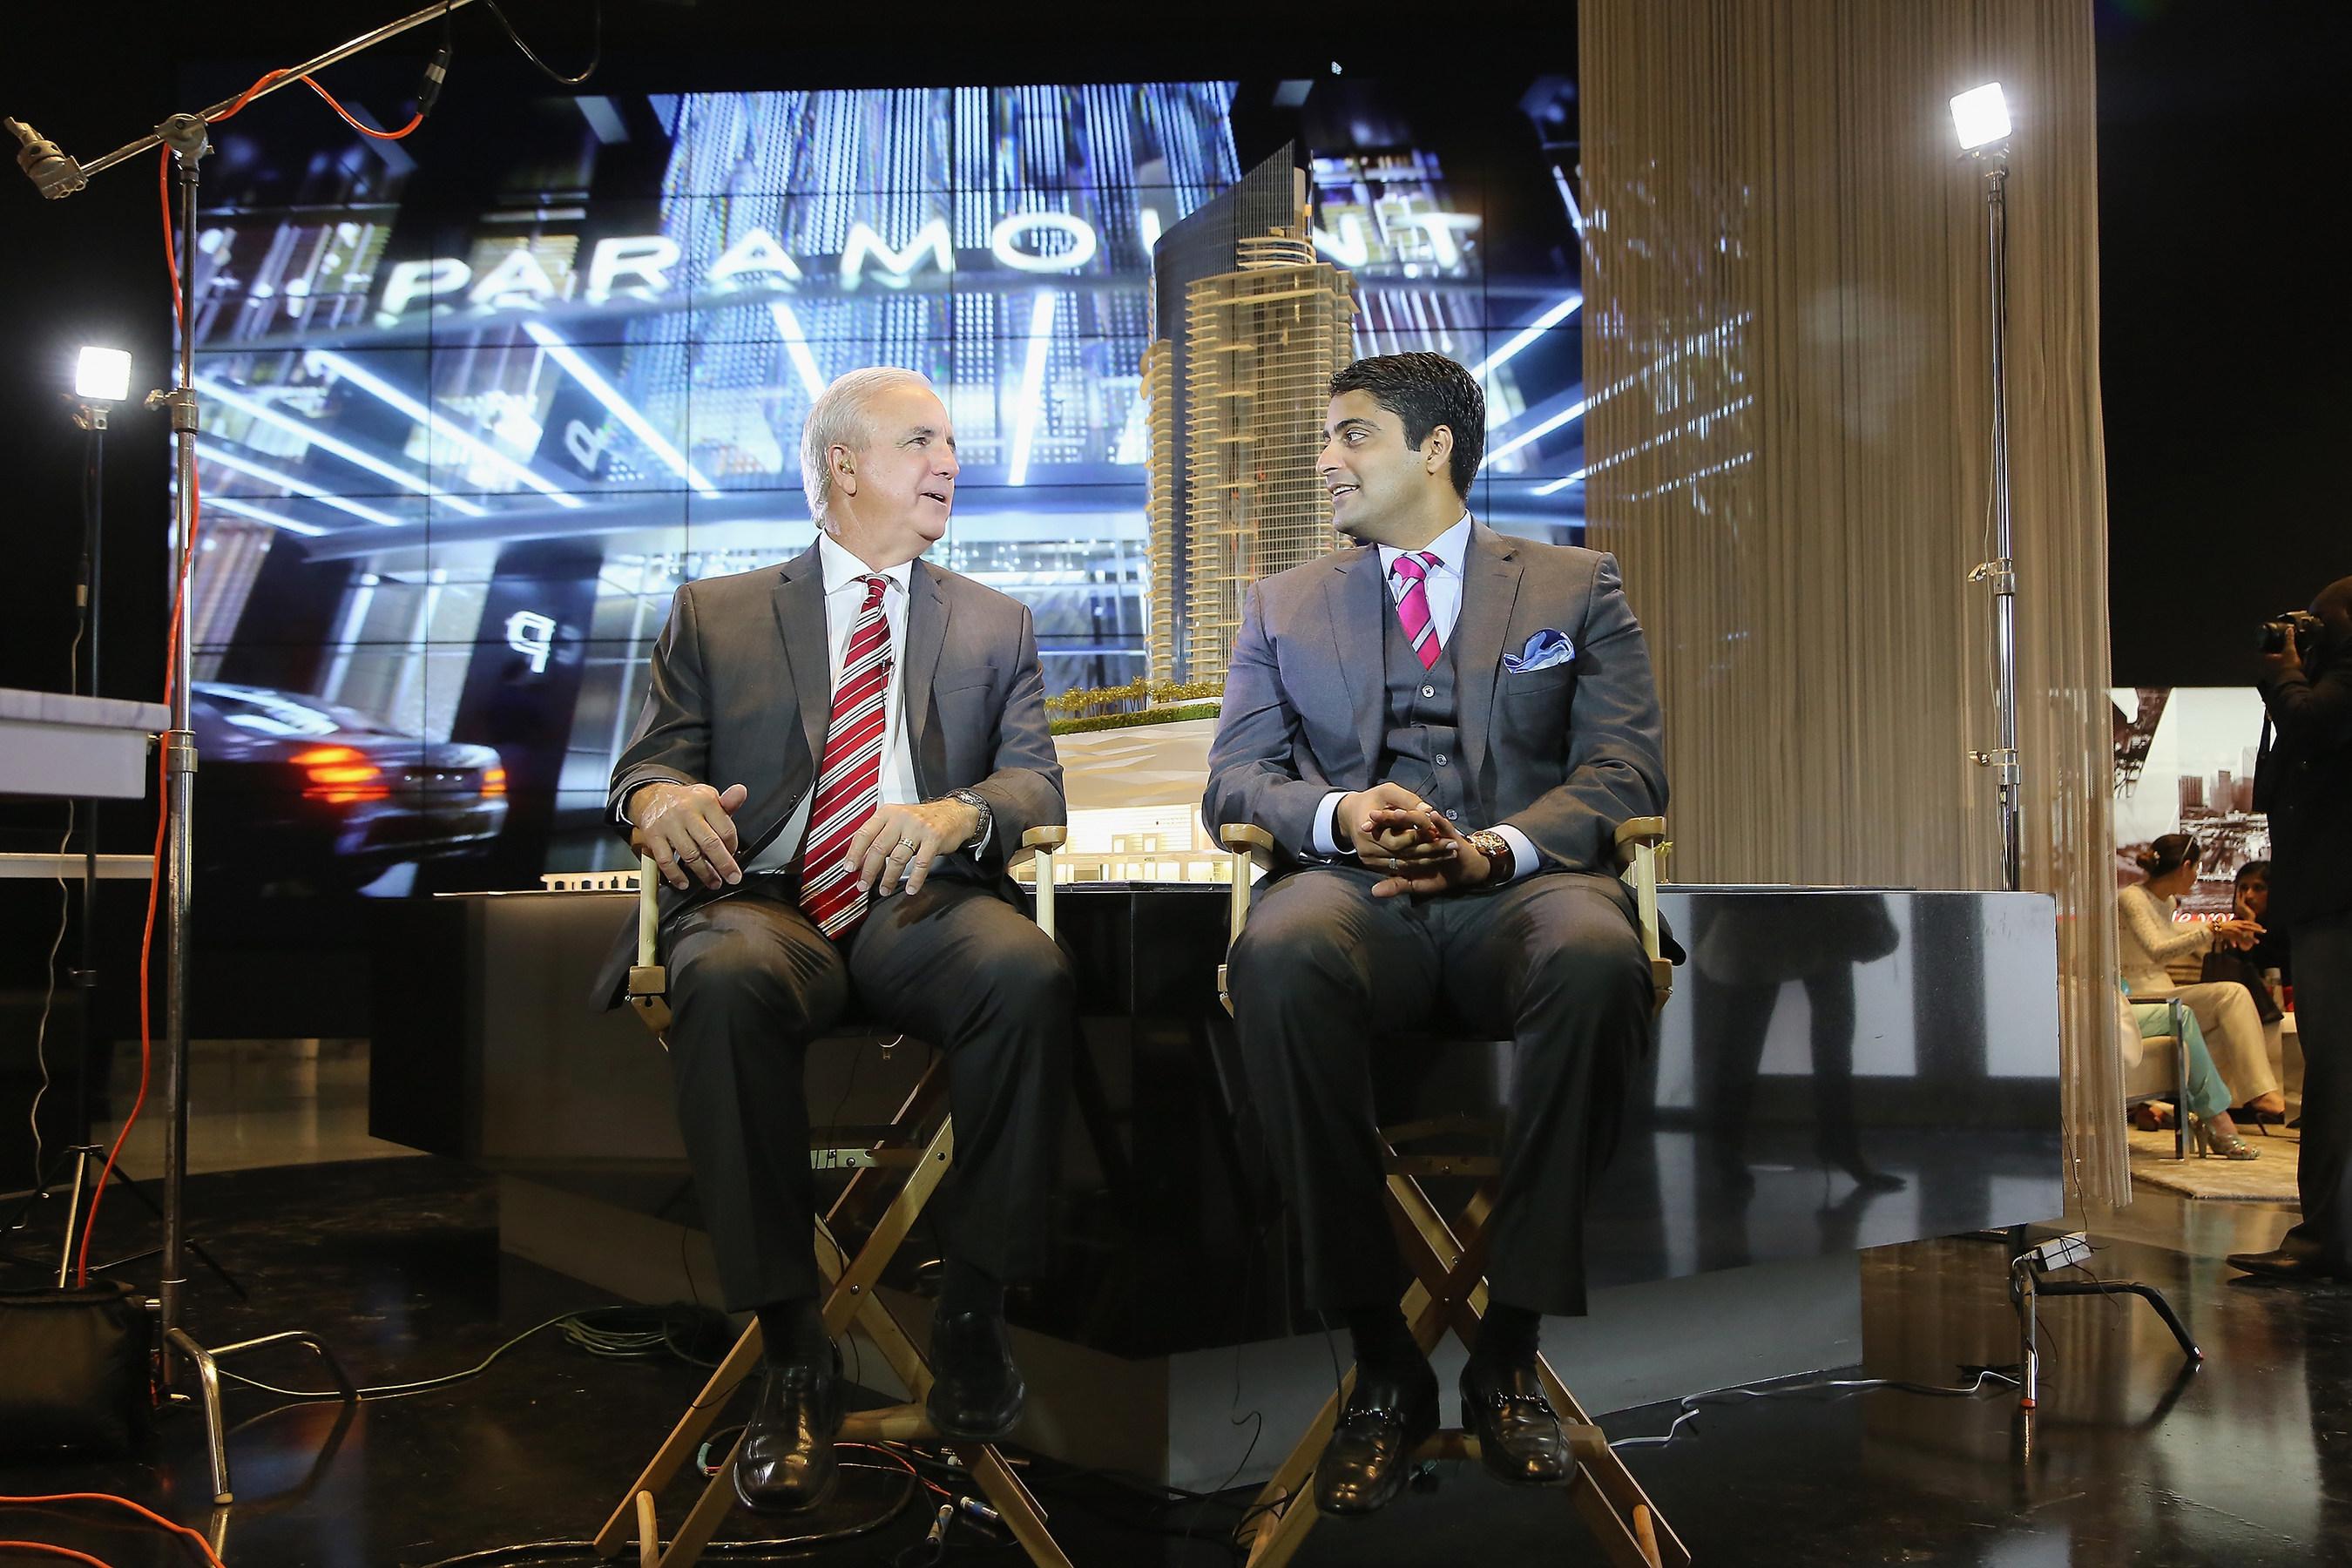 Miami-Dade Mayor Carlos Gimenez and Master Developer Nitin Motwani in Paramount Miami Worldcenter Sales Center on Ground Breaking Day Preparing for FOX News Live Satellite Interview (Credit: World Satellite TelevisionNews).